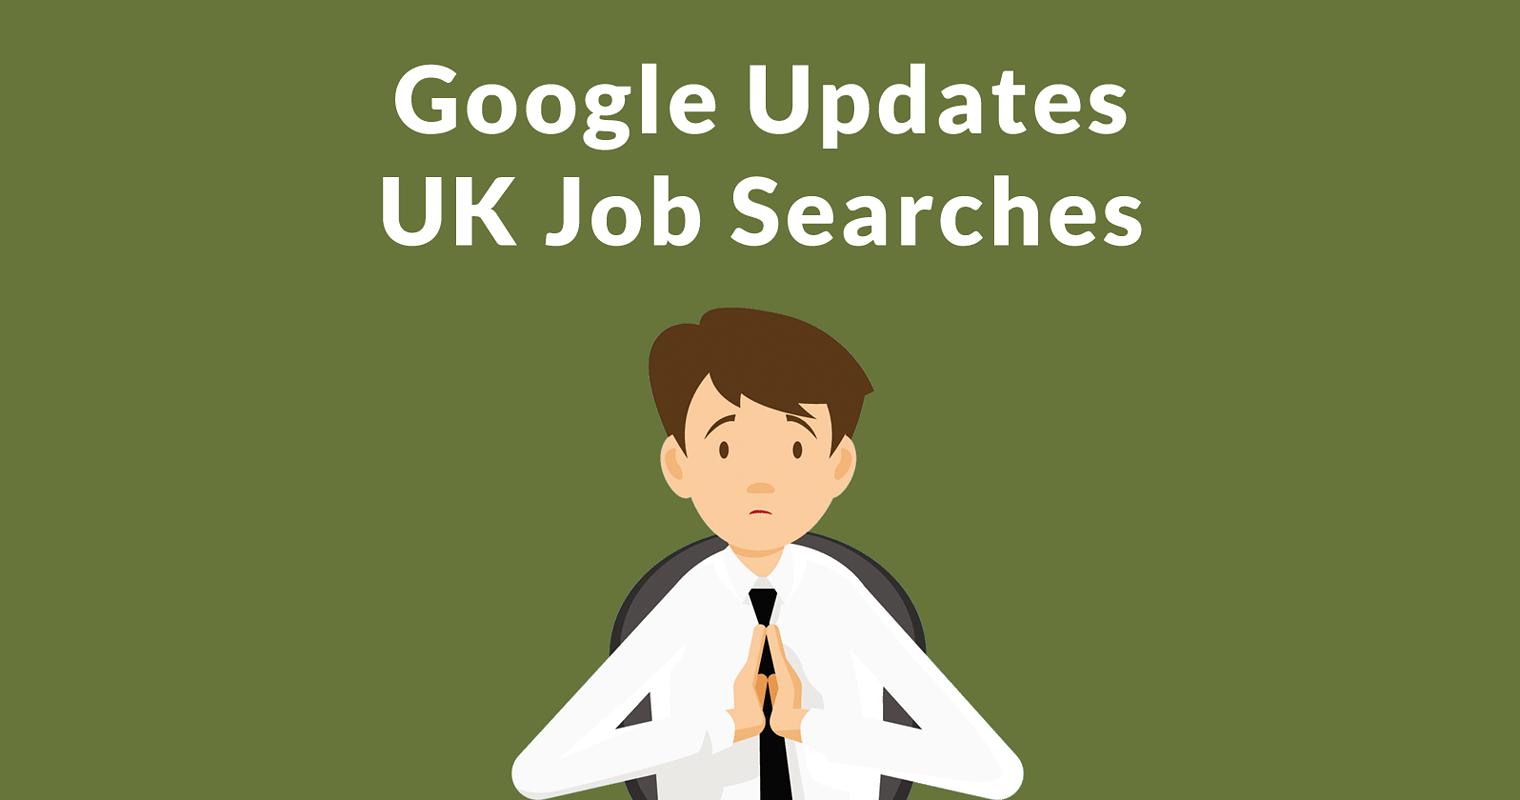 Google Updates UK Job Search Results